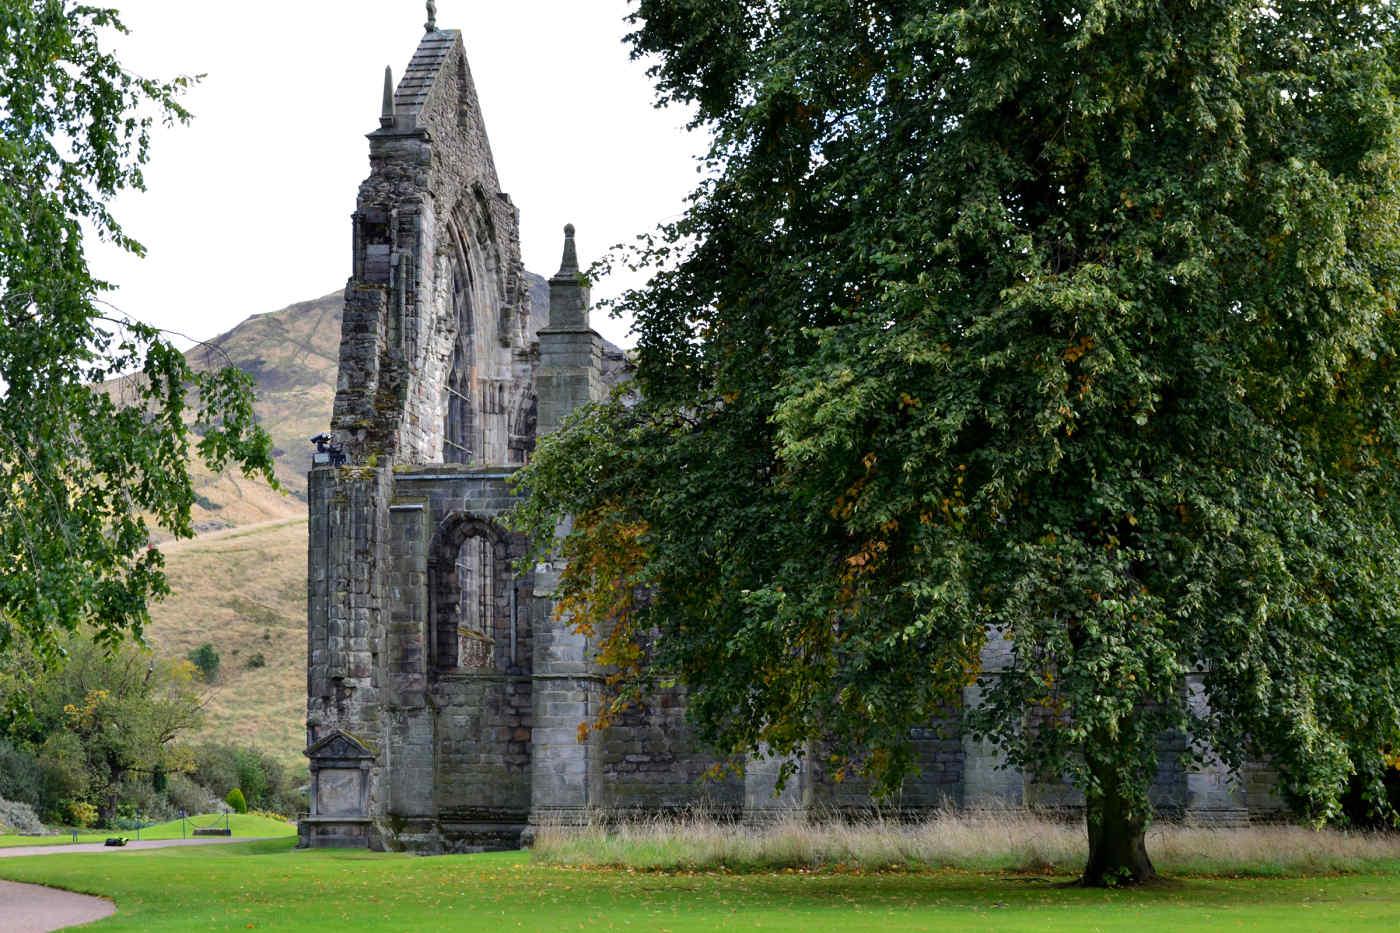 Holyrood Park in Edinburgh, Scotland